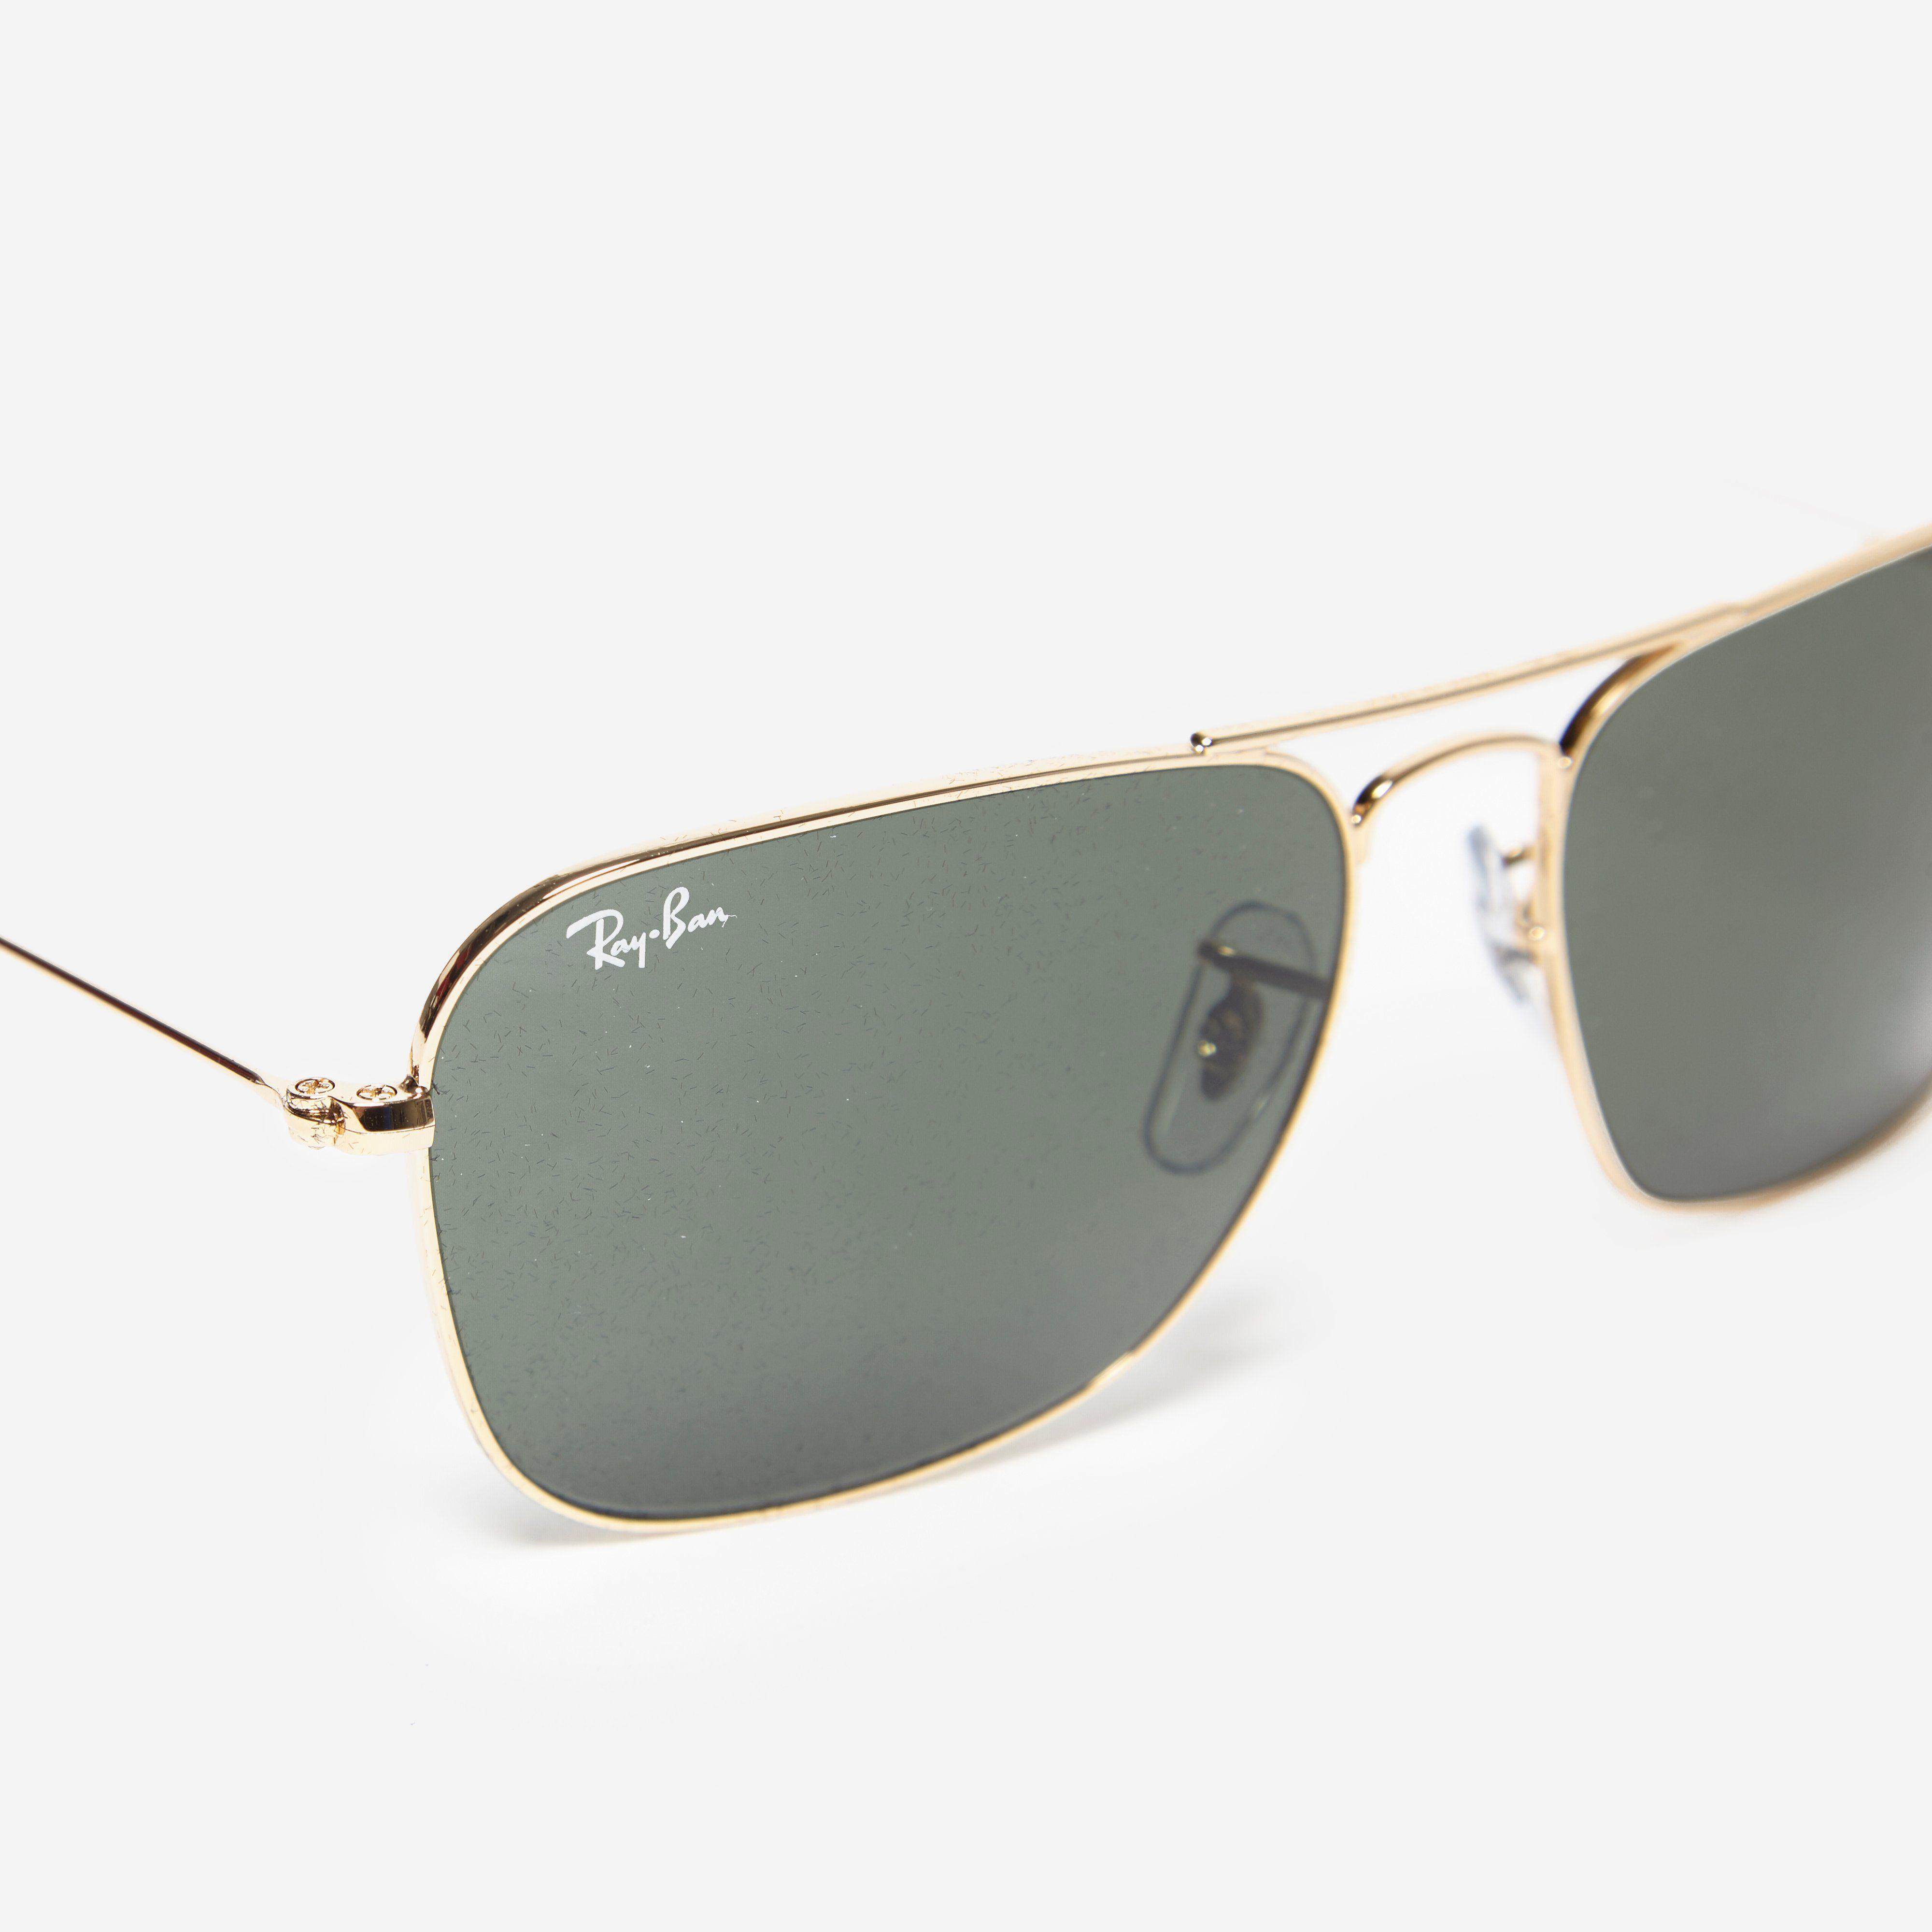 Ray-Ban Caravan Sunglasses